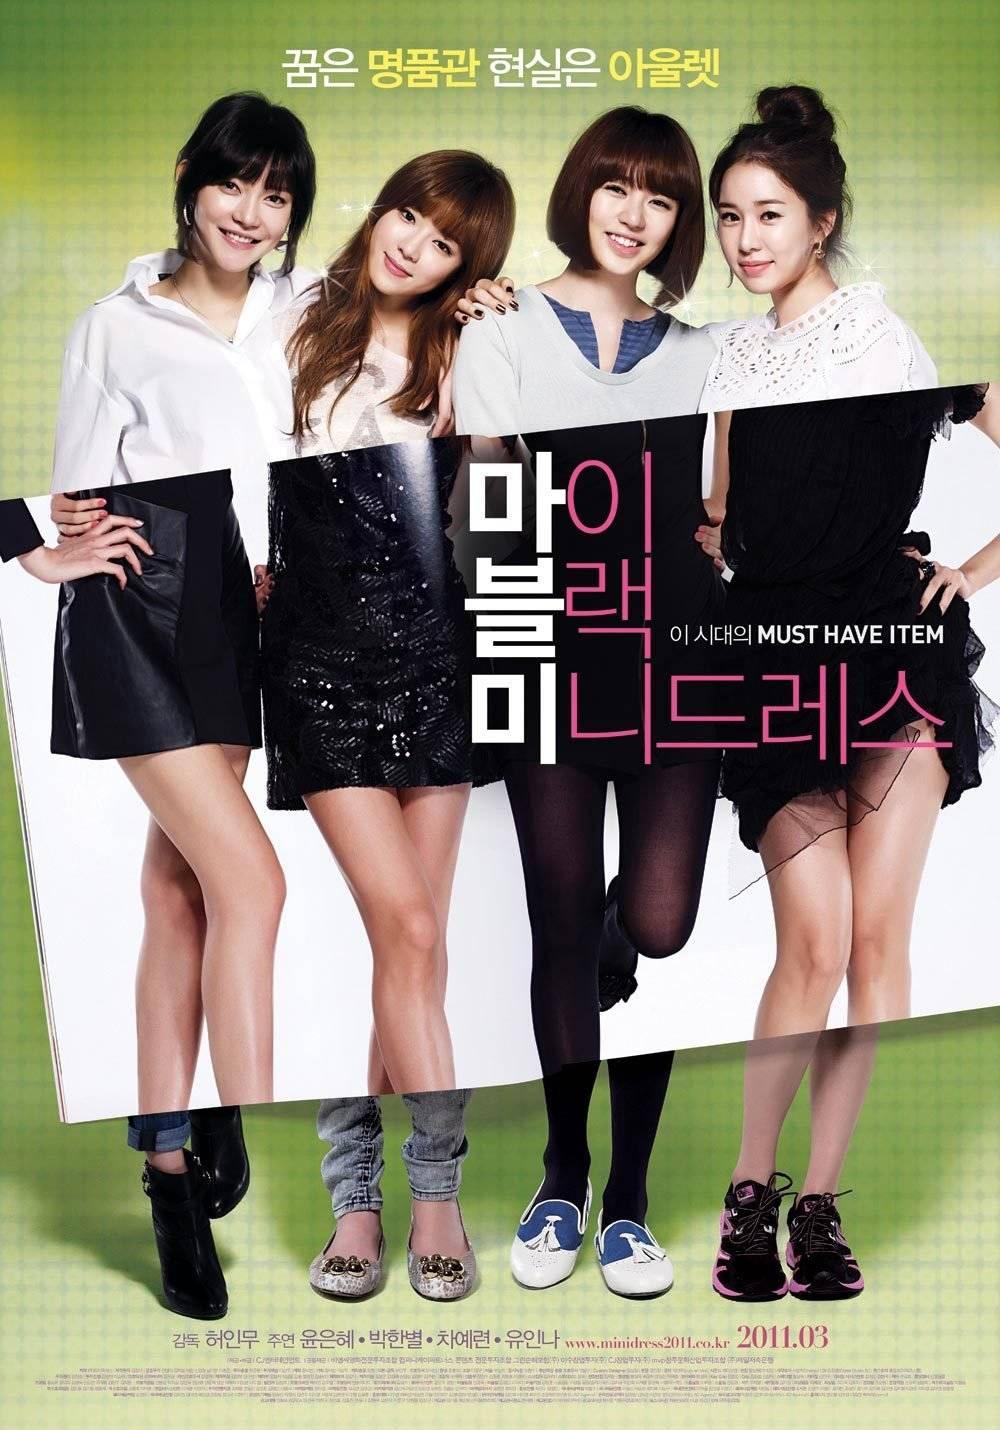 Black dress korean - My Black Mini Dress